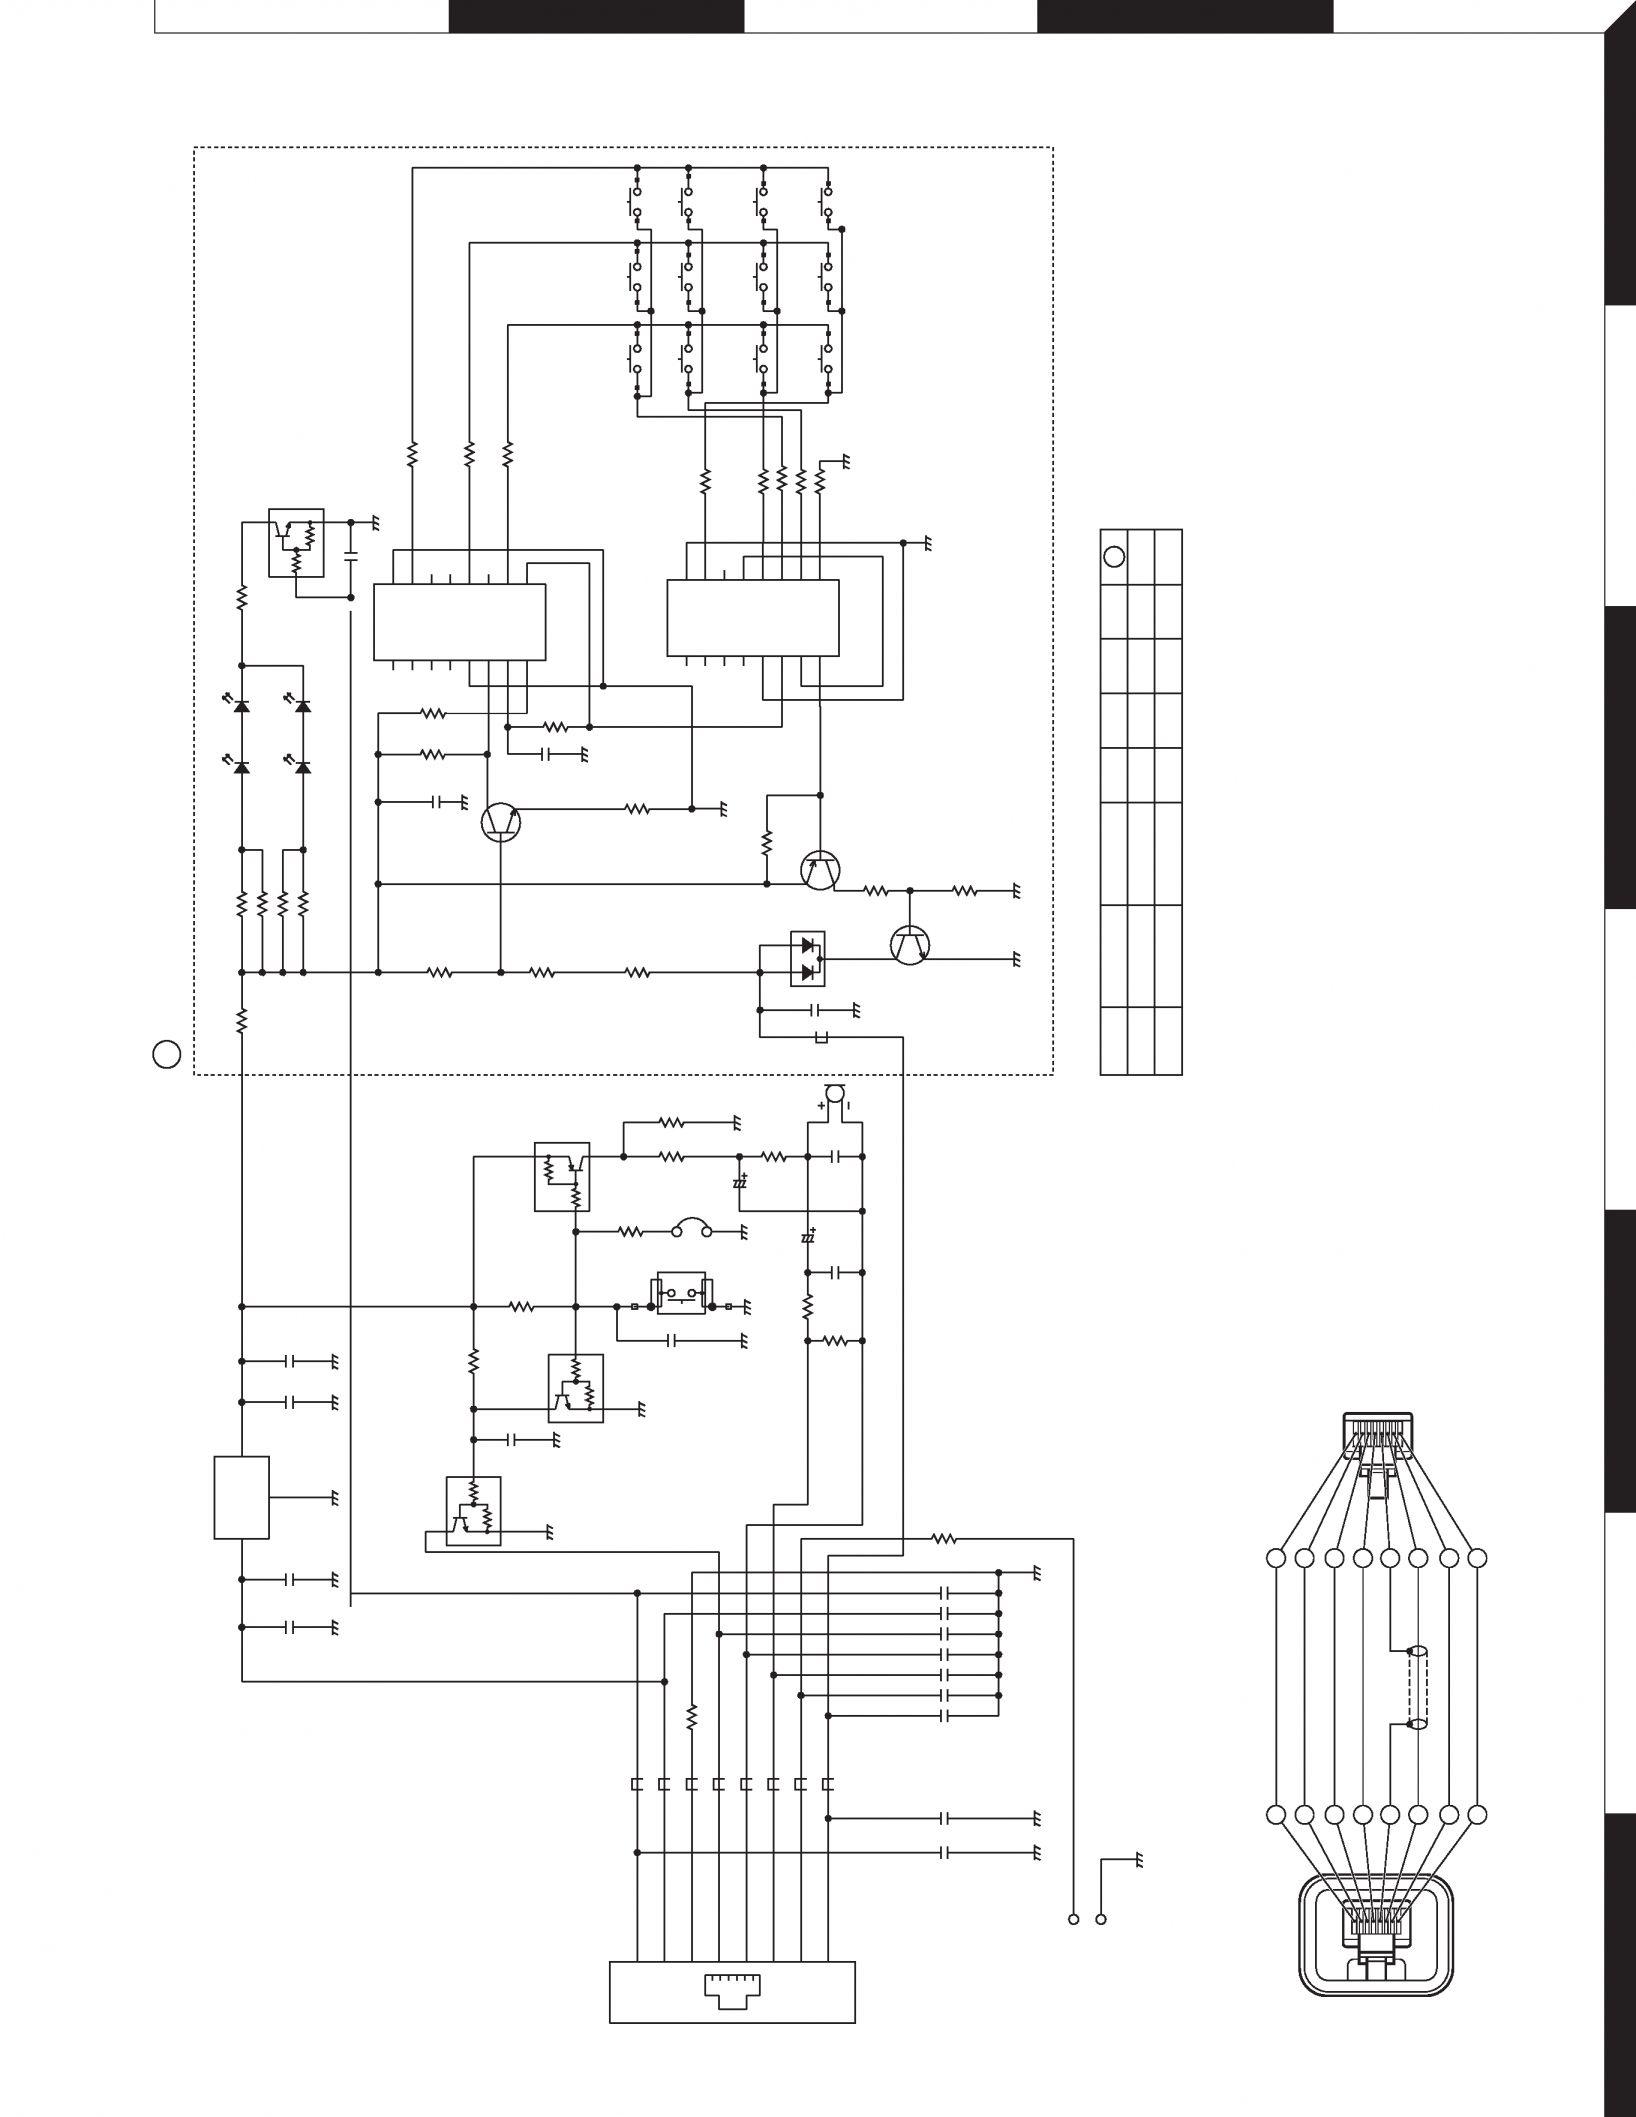 Bajaj Pulsar 150 Electrical Wiring Diagram And Kenwood Mic